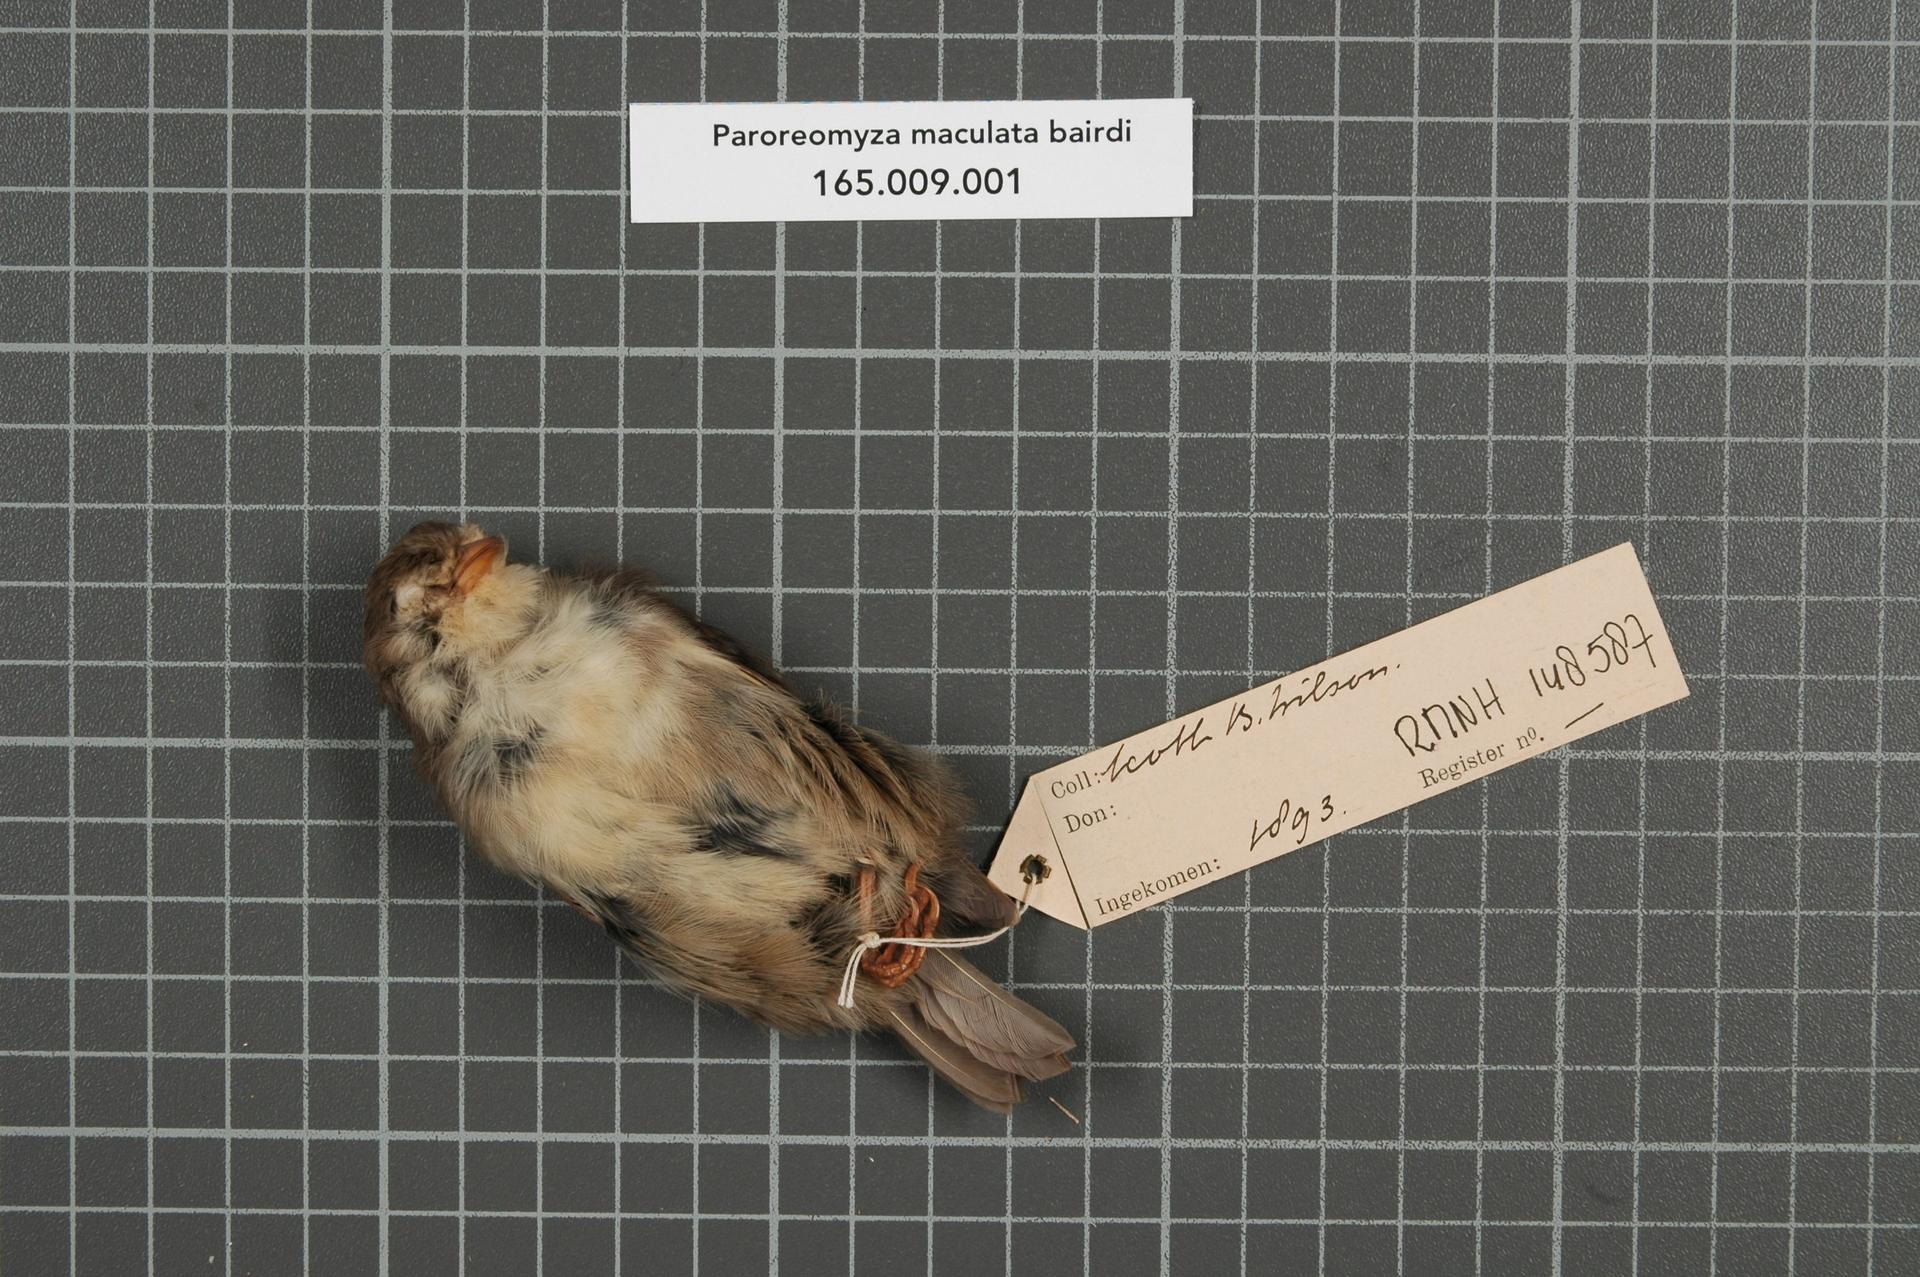 RMNH.AVES.148587 | Paroreomyza maculata bairdi Stejneger, 1887